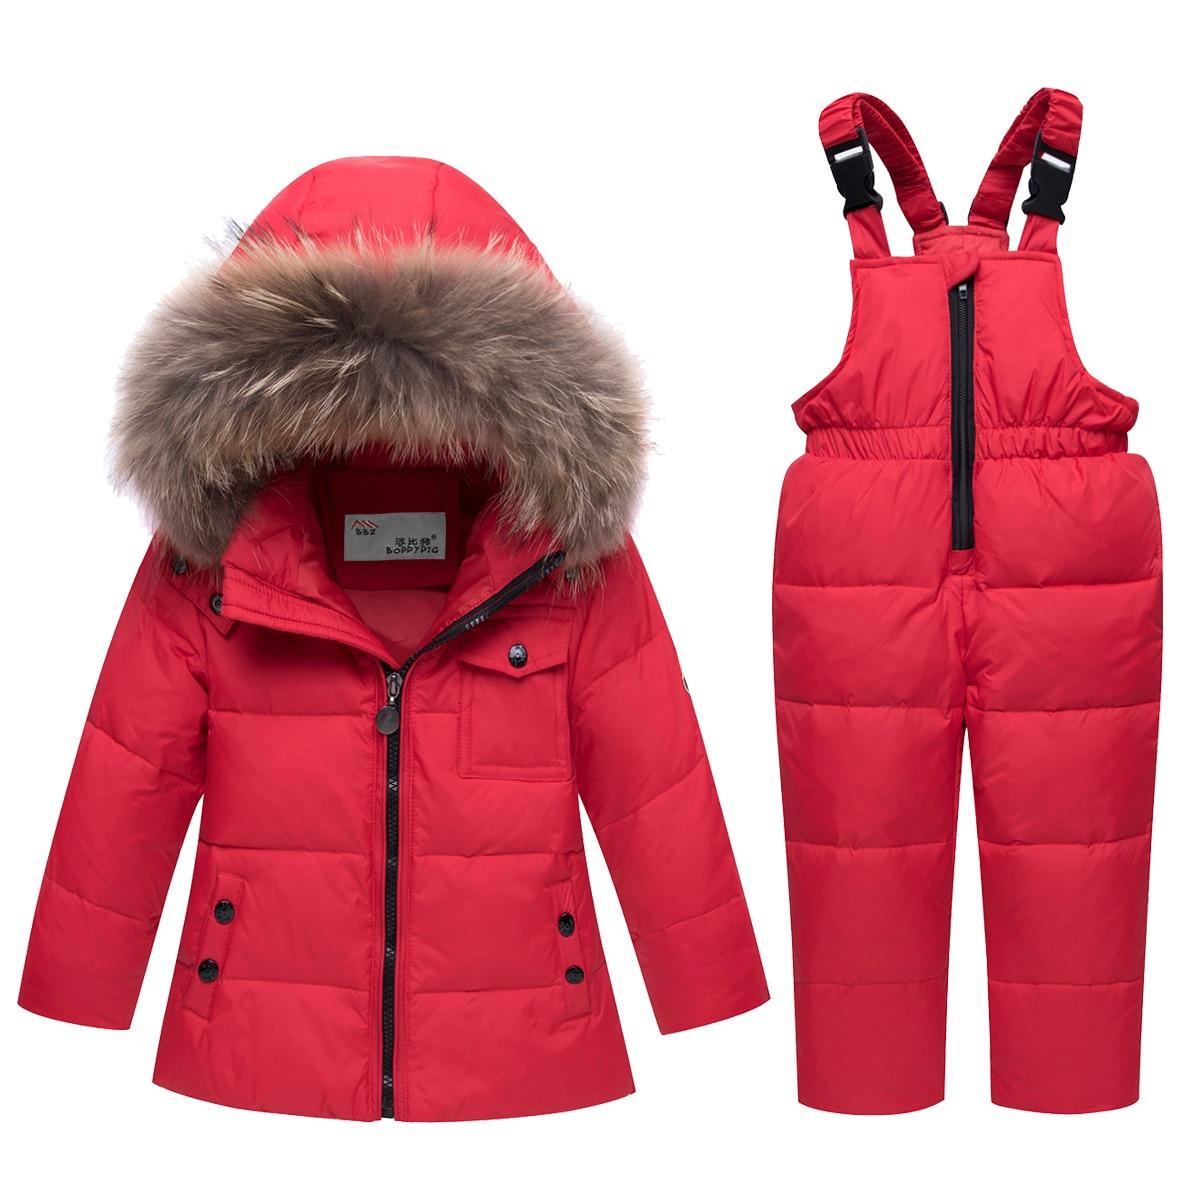 Russian Winter Suits for Boys Girls 2019 Ski Suit Children Clothing Set Baby Duck Down Jacket Coat + Overalls Warm Kids Snowsuit